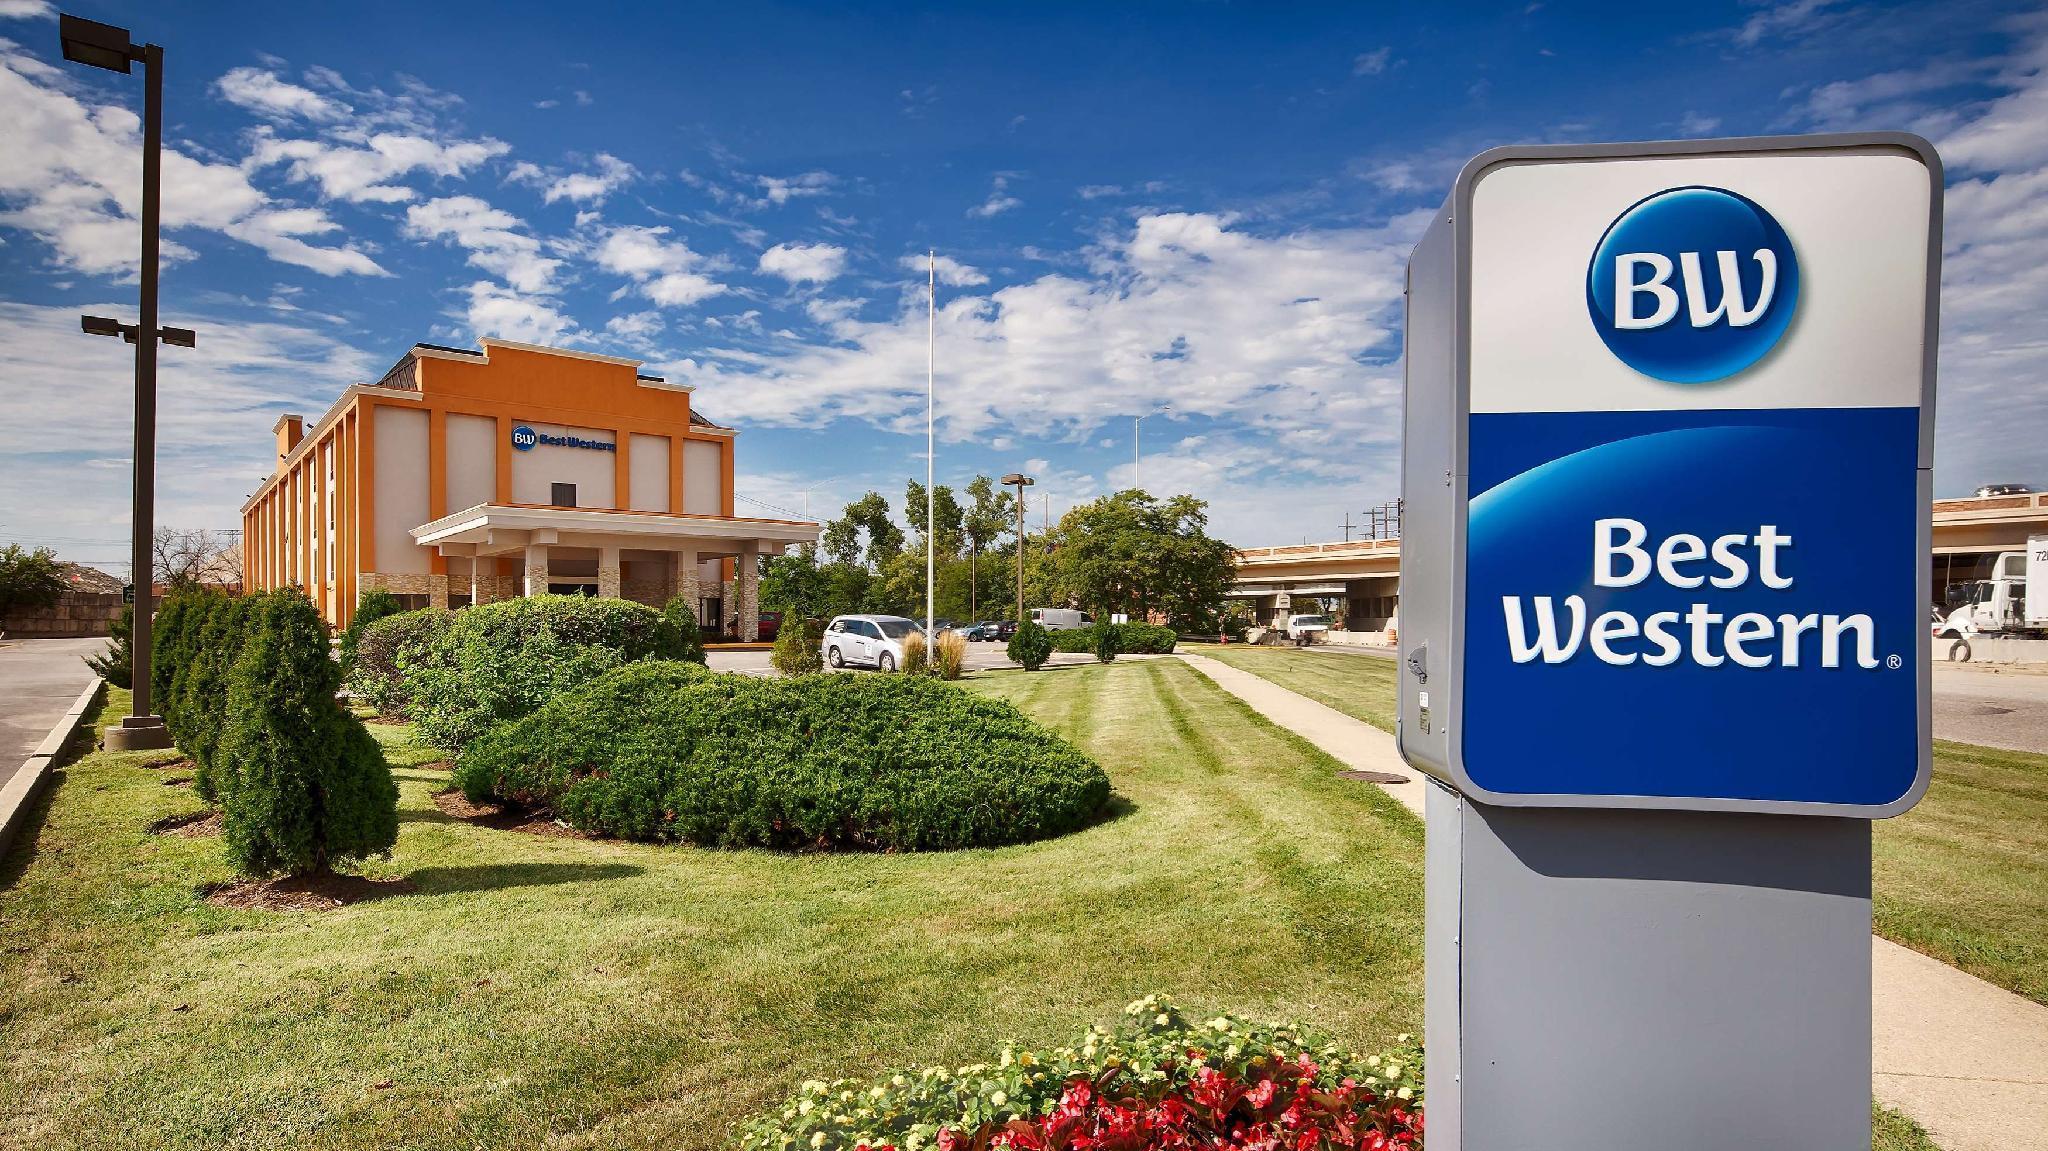 Best Western O'Hare/Elk Grove Hotel, Cook